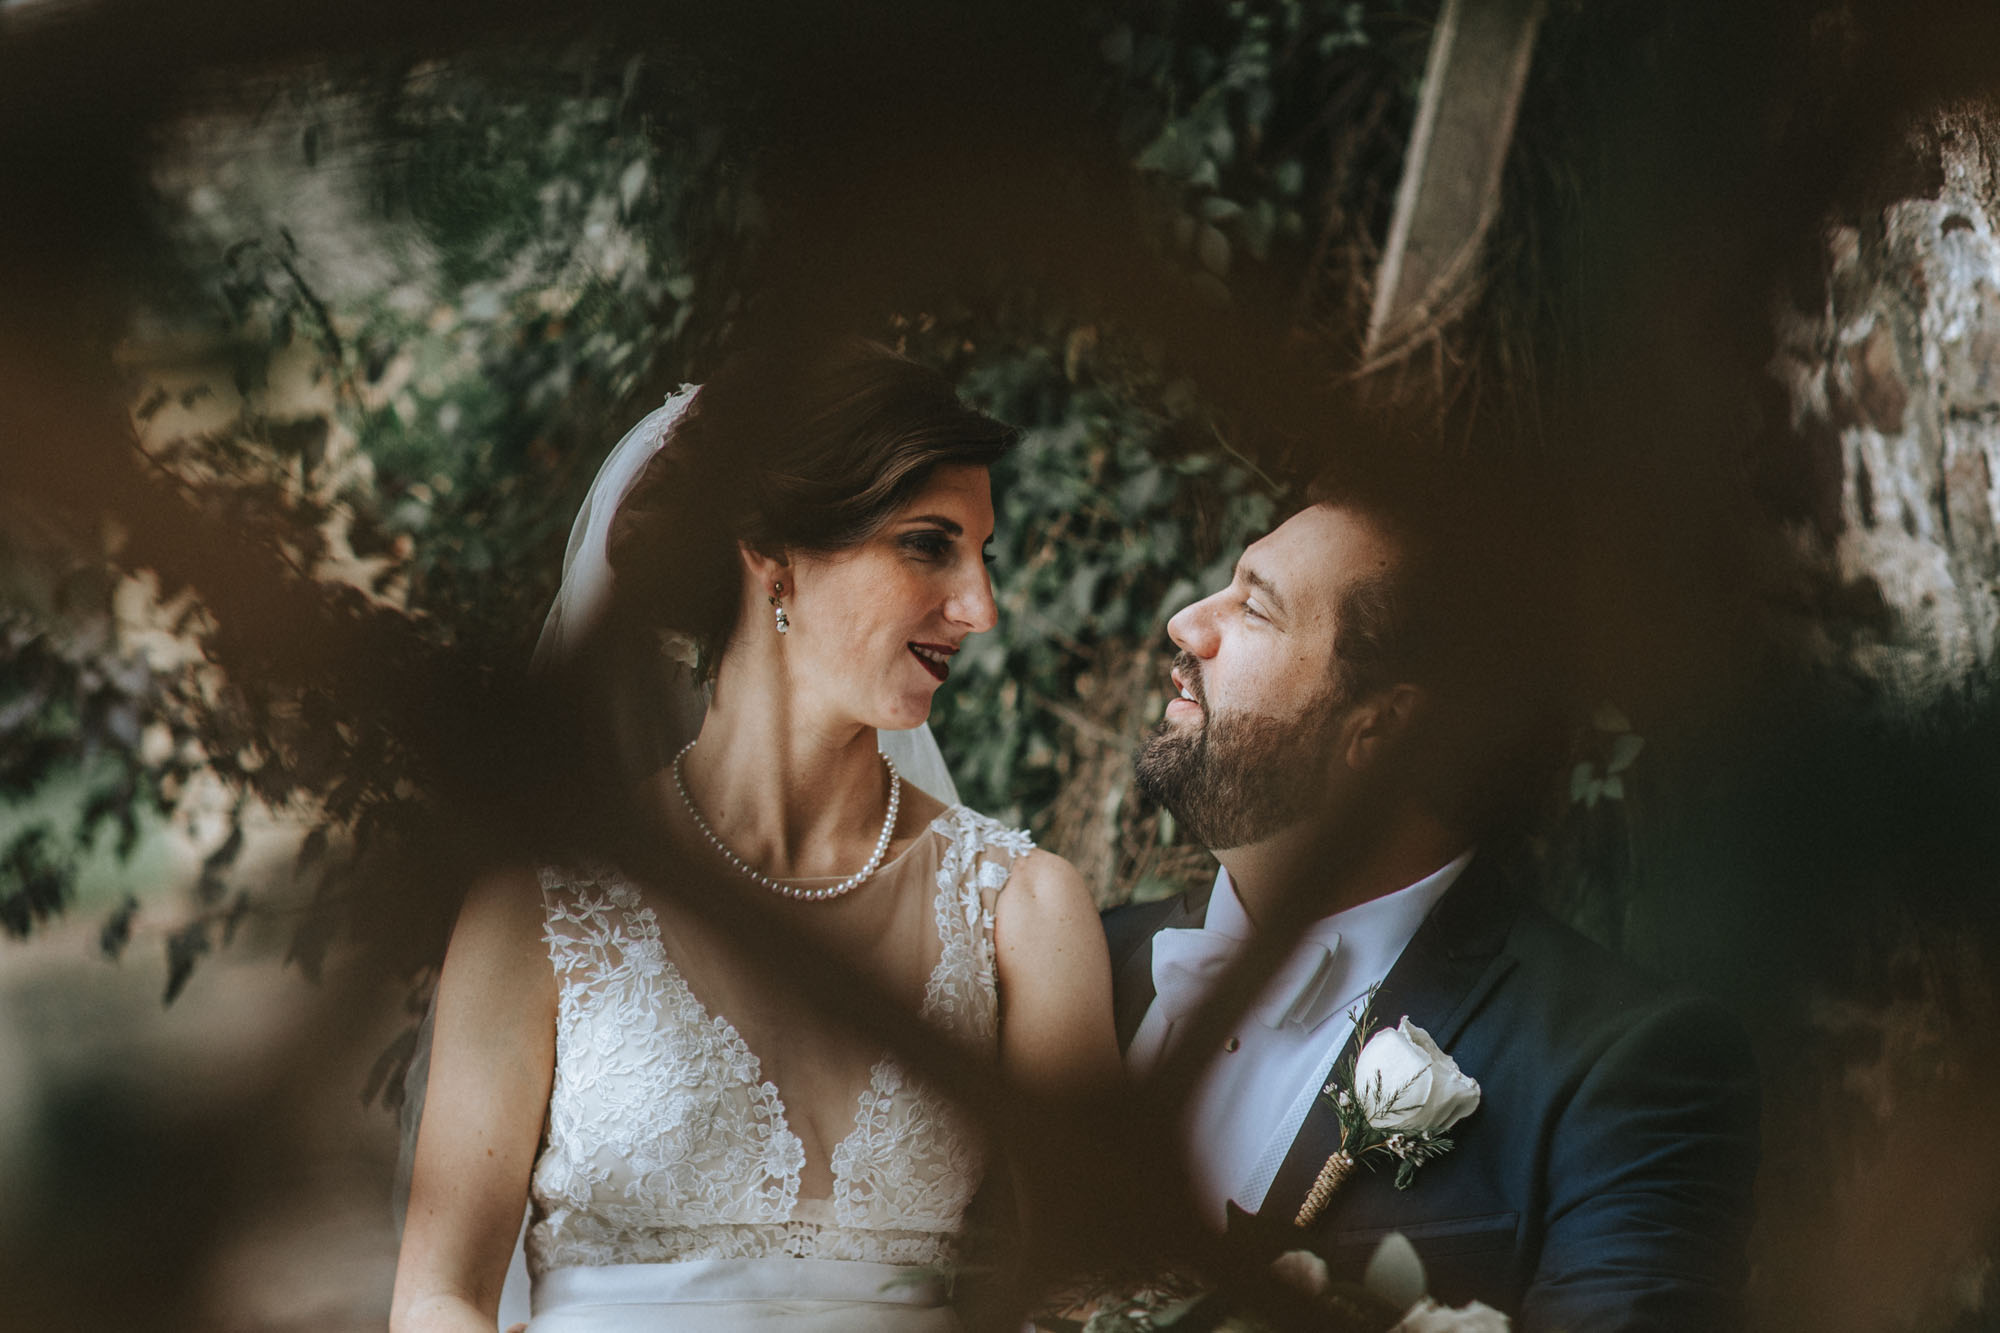 Twisted-Oaks-Studio-Arianne-Sean-Wedding-261.jpg